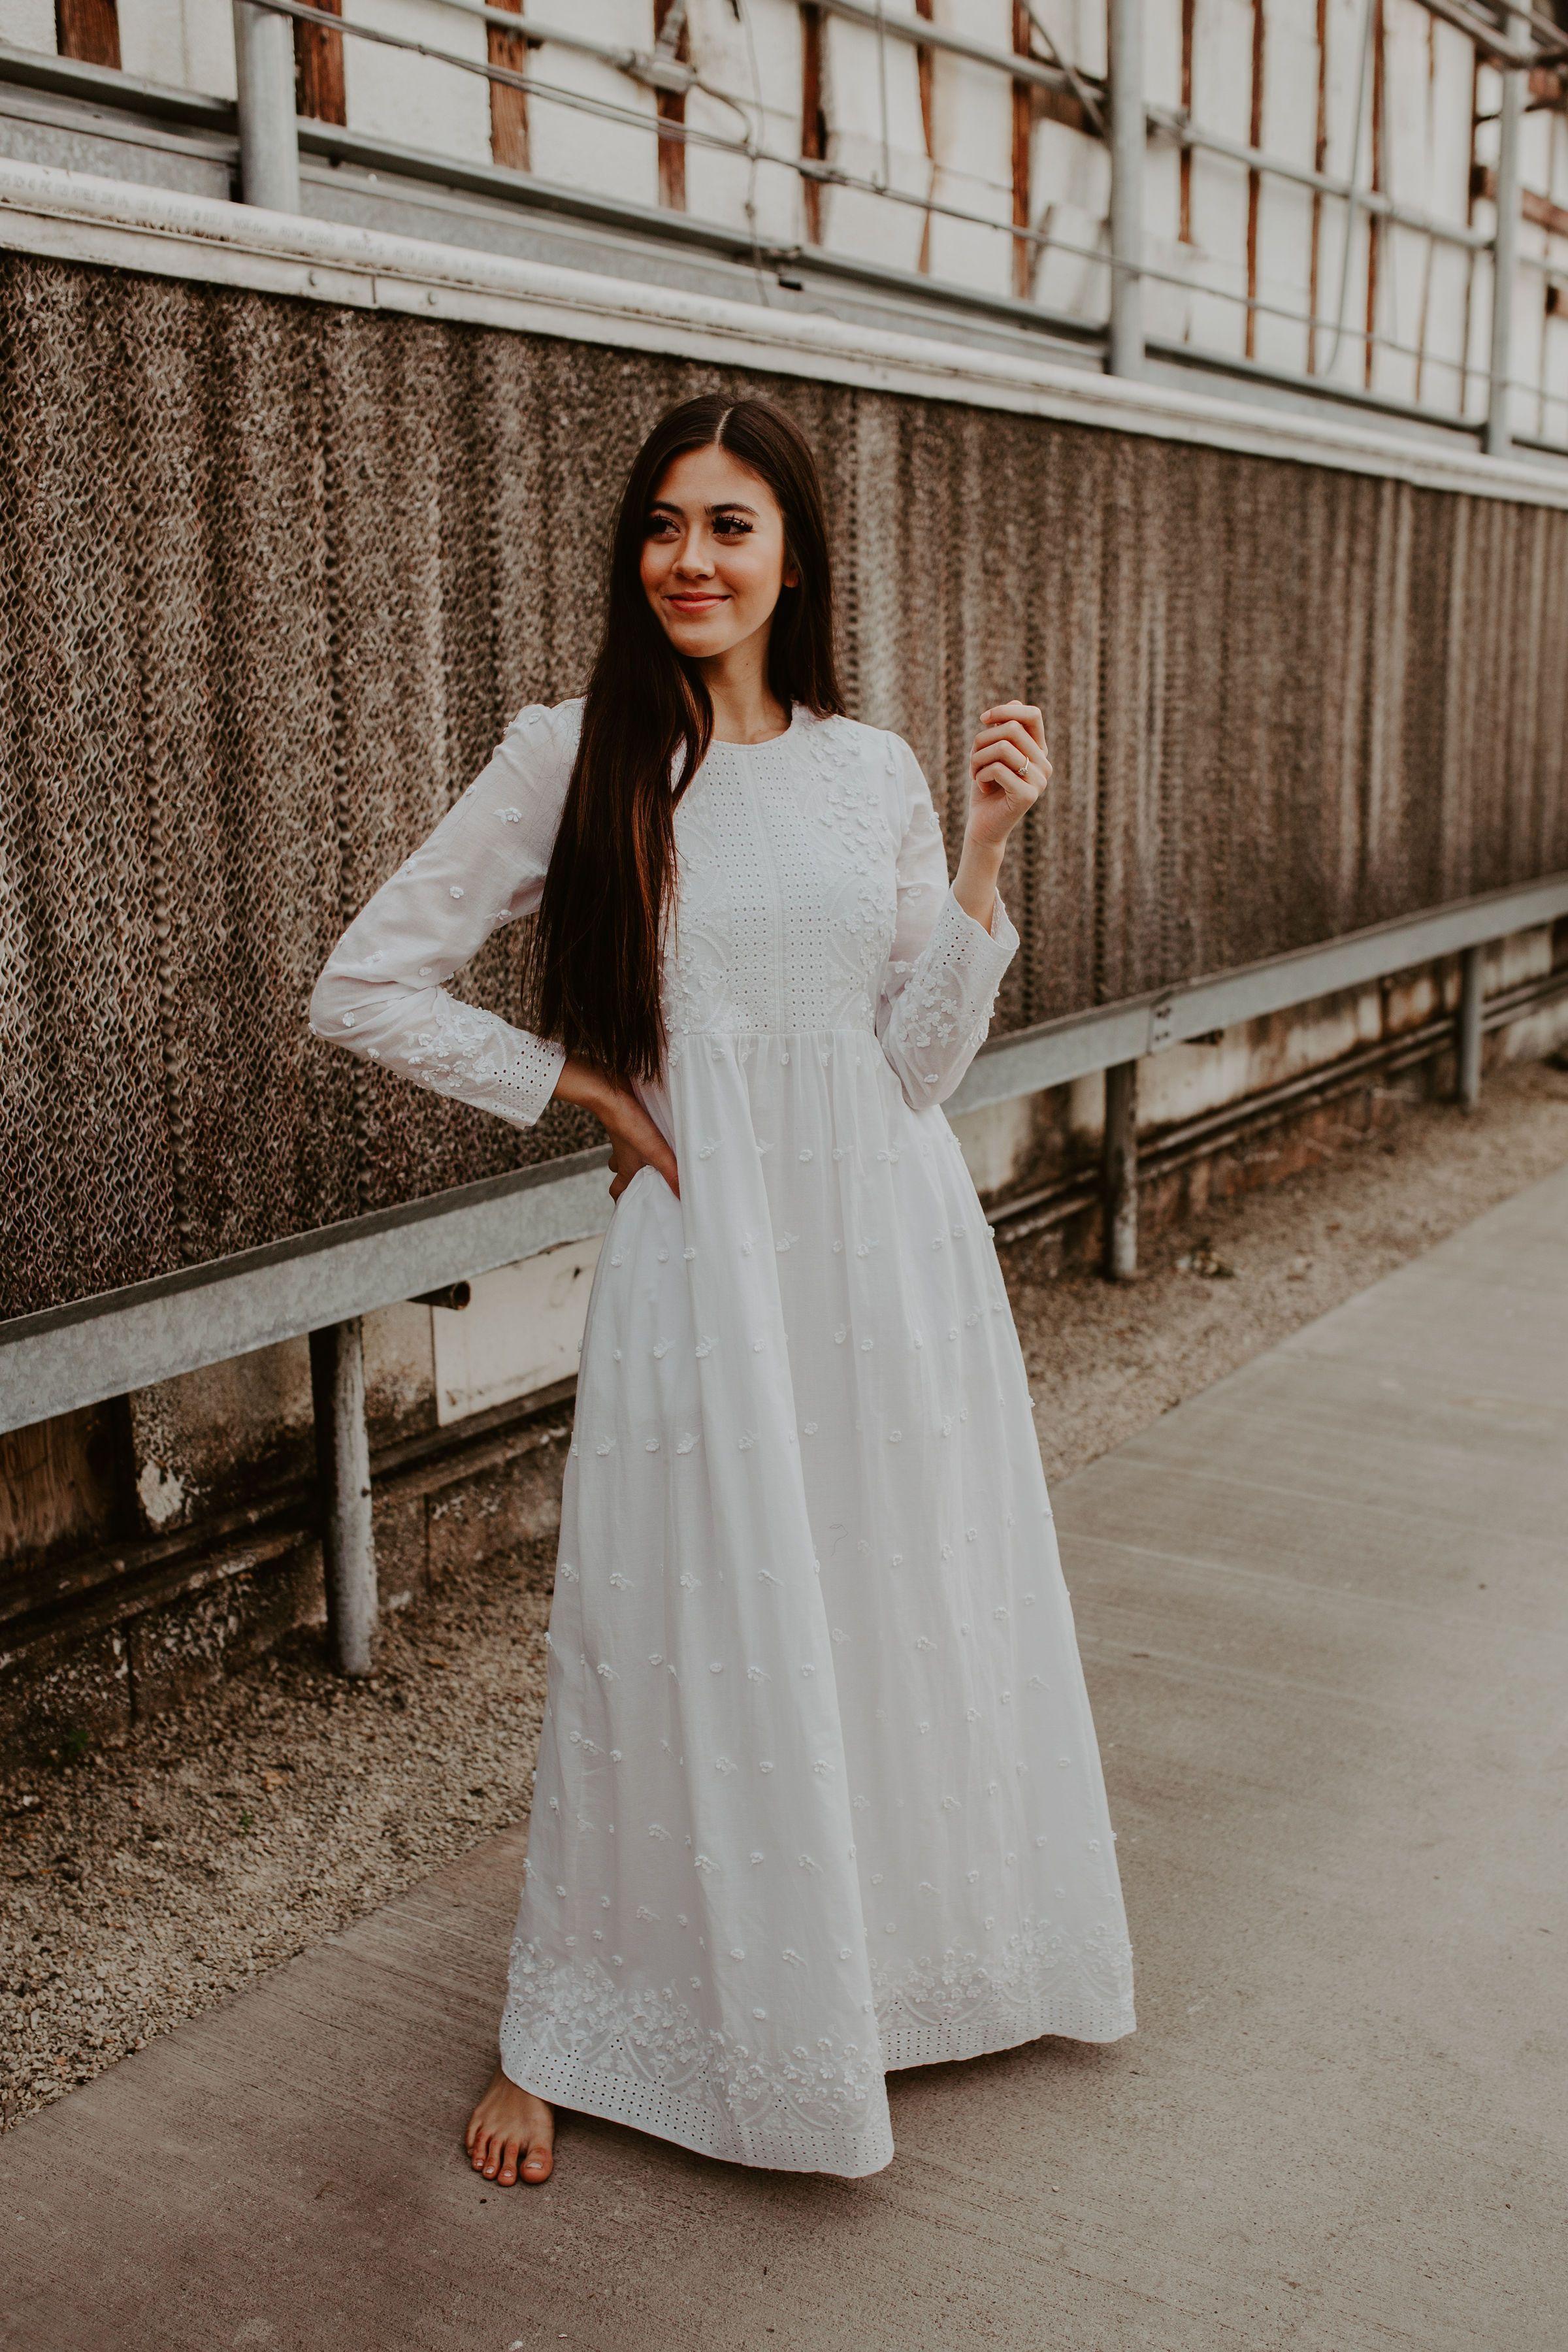 The White Ava White Long Sleeve Dress Temple Dress Dresses For Sale [ 3600 x 2400 Pixel ]